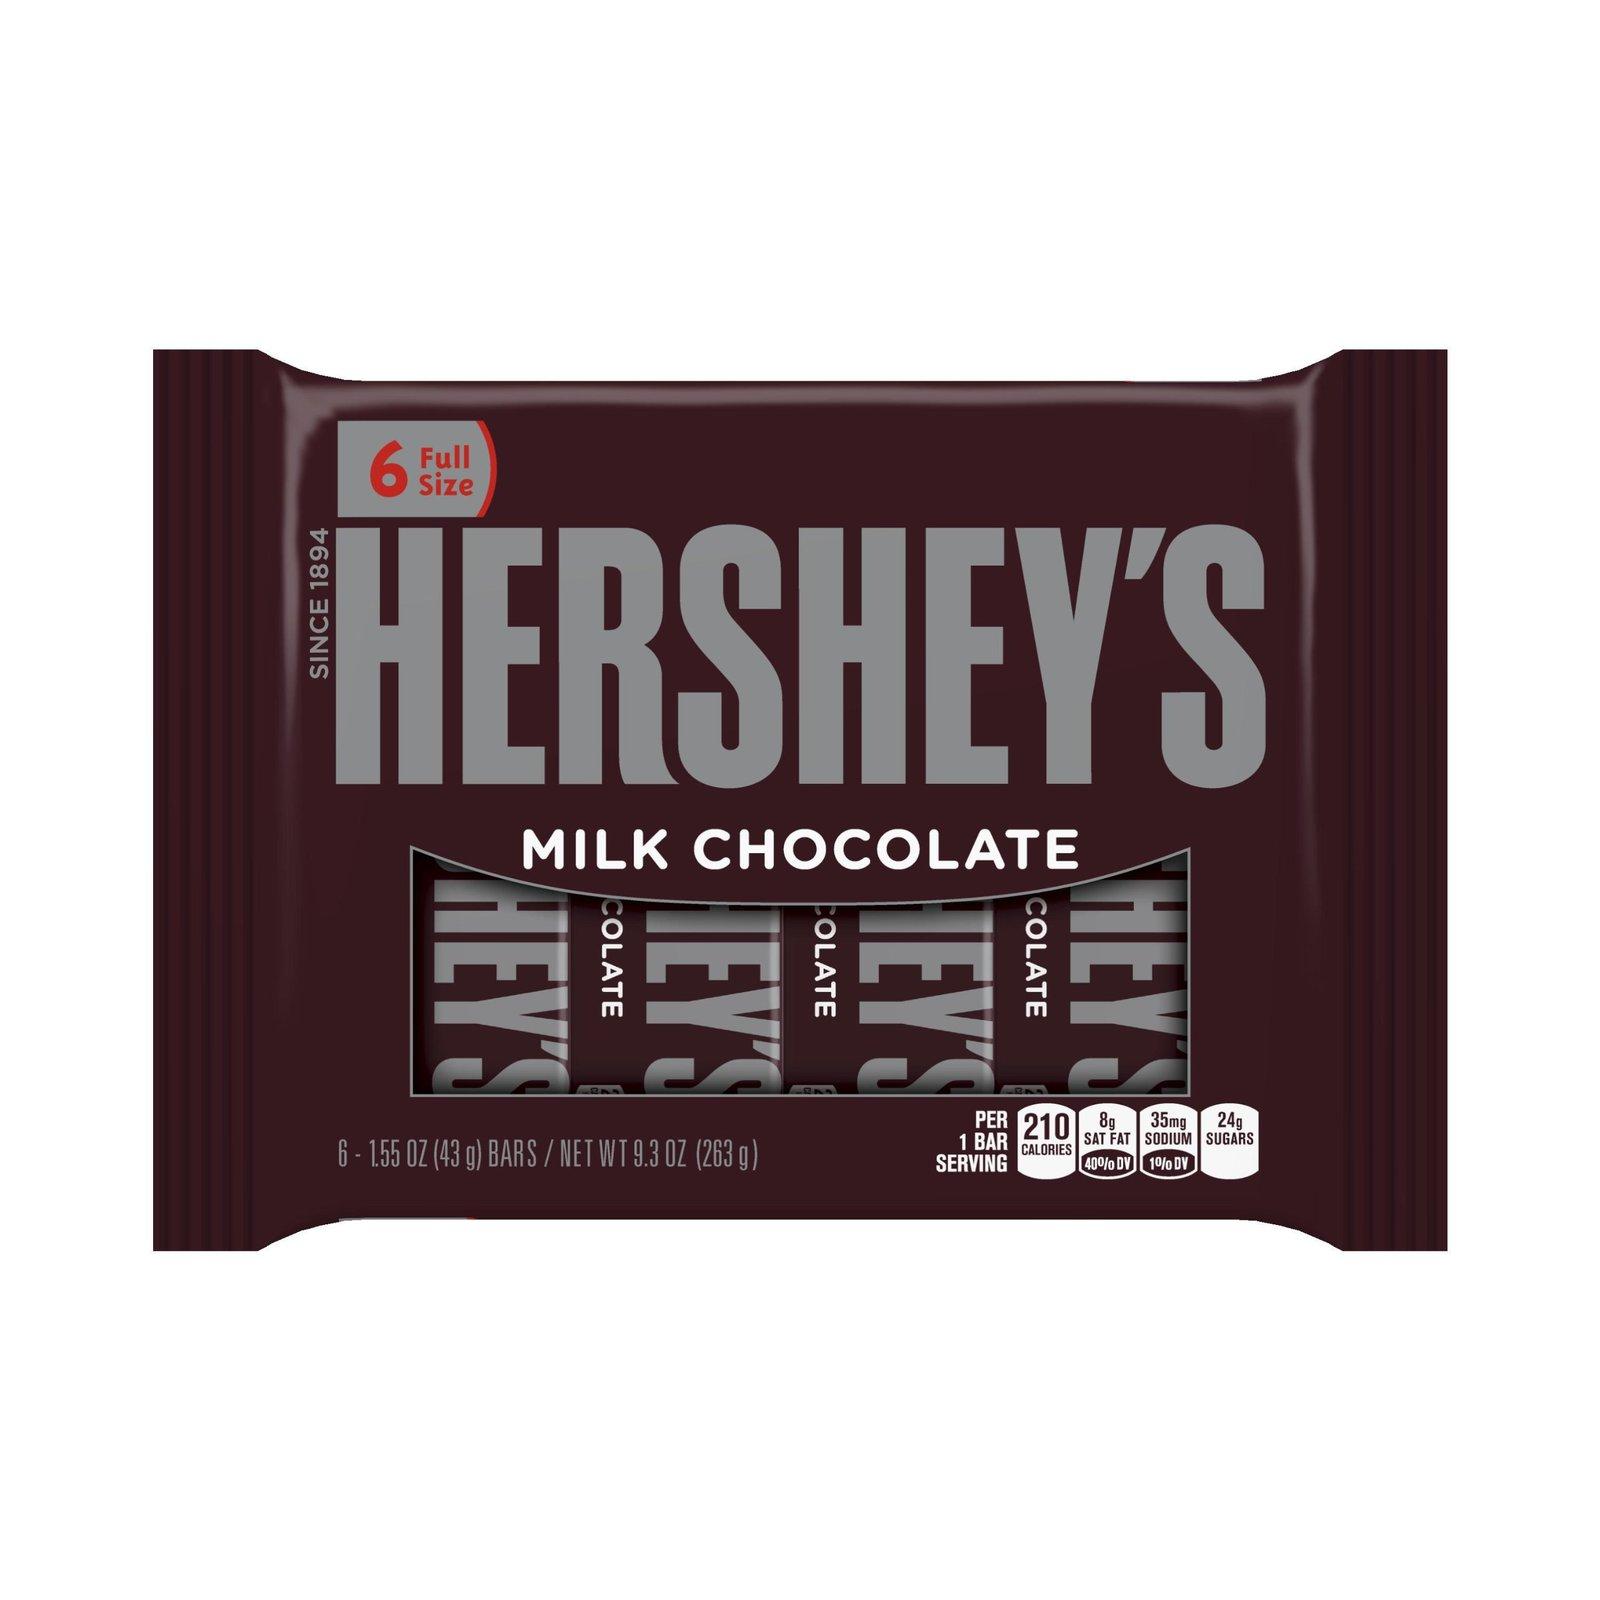 Hershey chocolate bar coupons